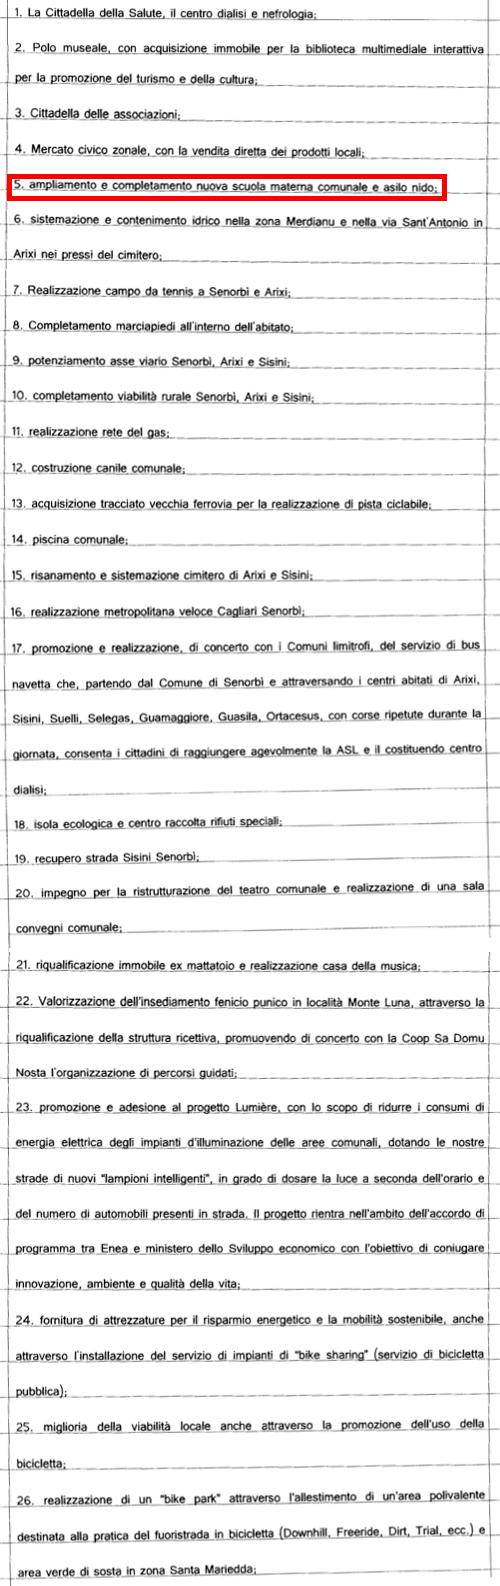 Lista